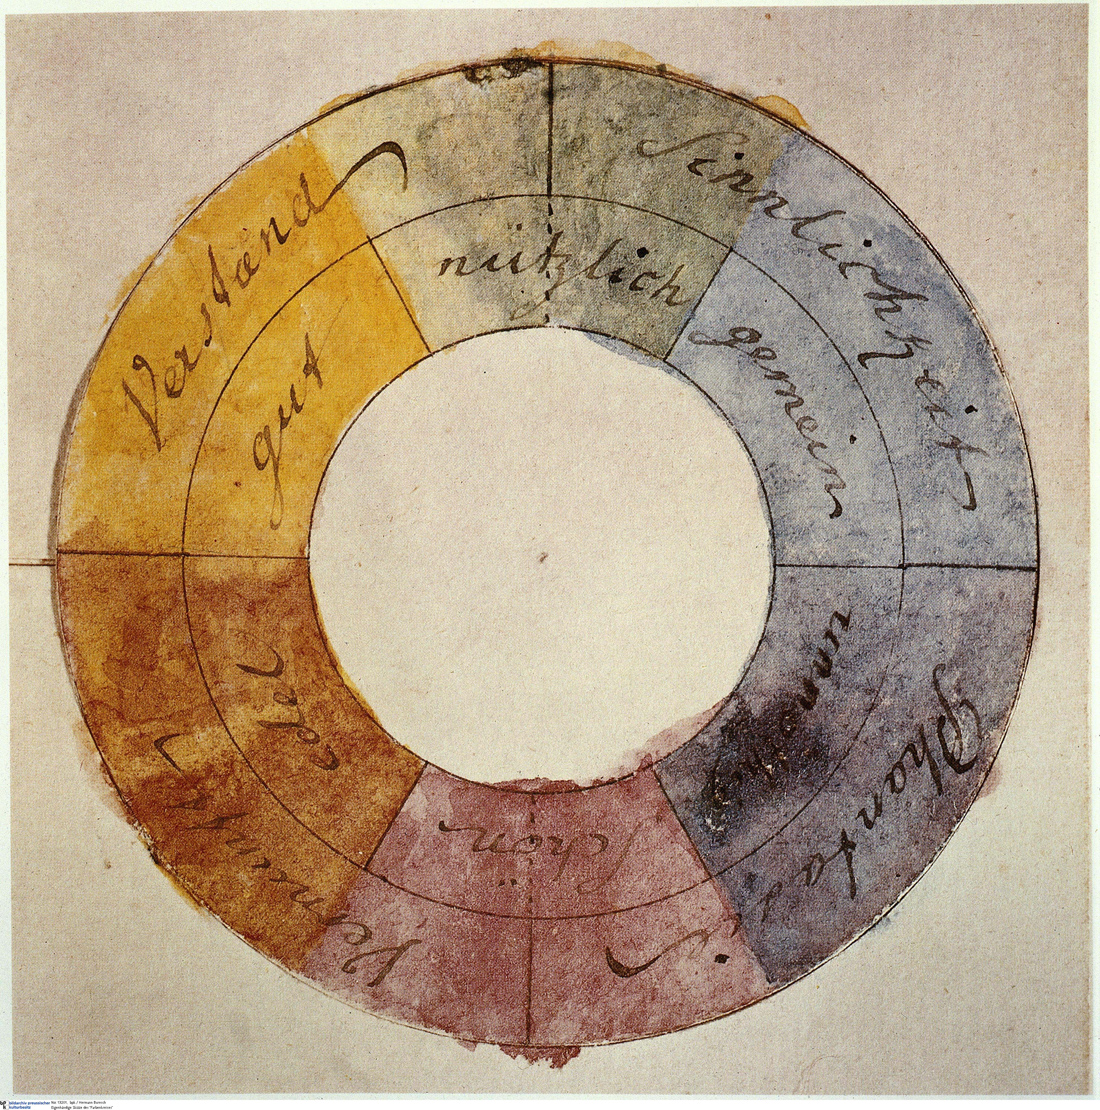 Color circle, by Johann Wolfgang von Goethe, 1809. Goethe House, Frankfurt, Germany.